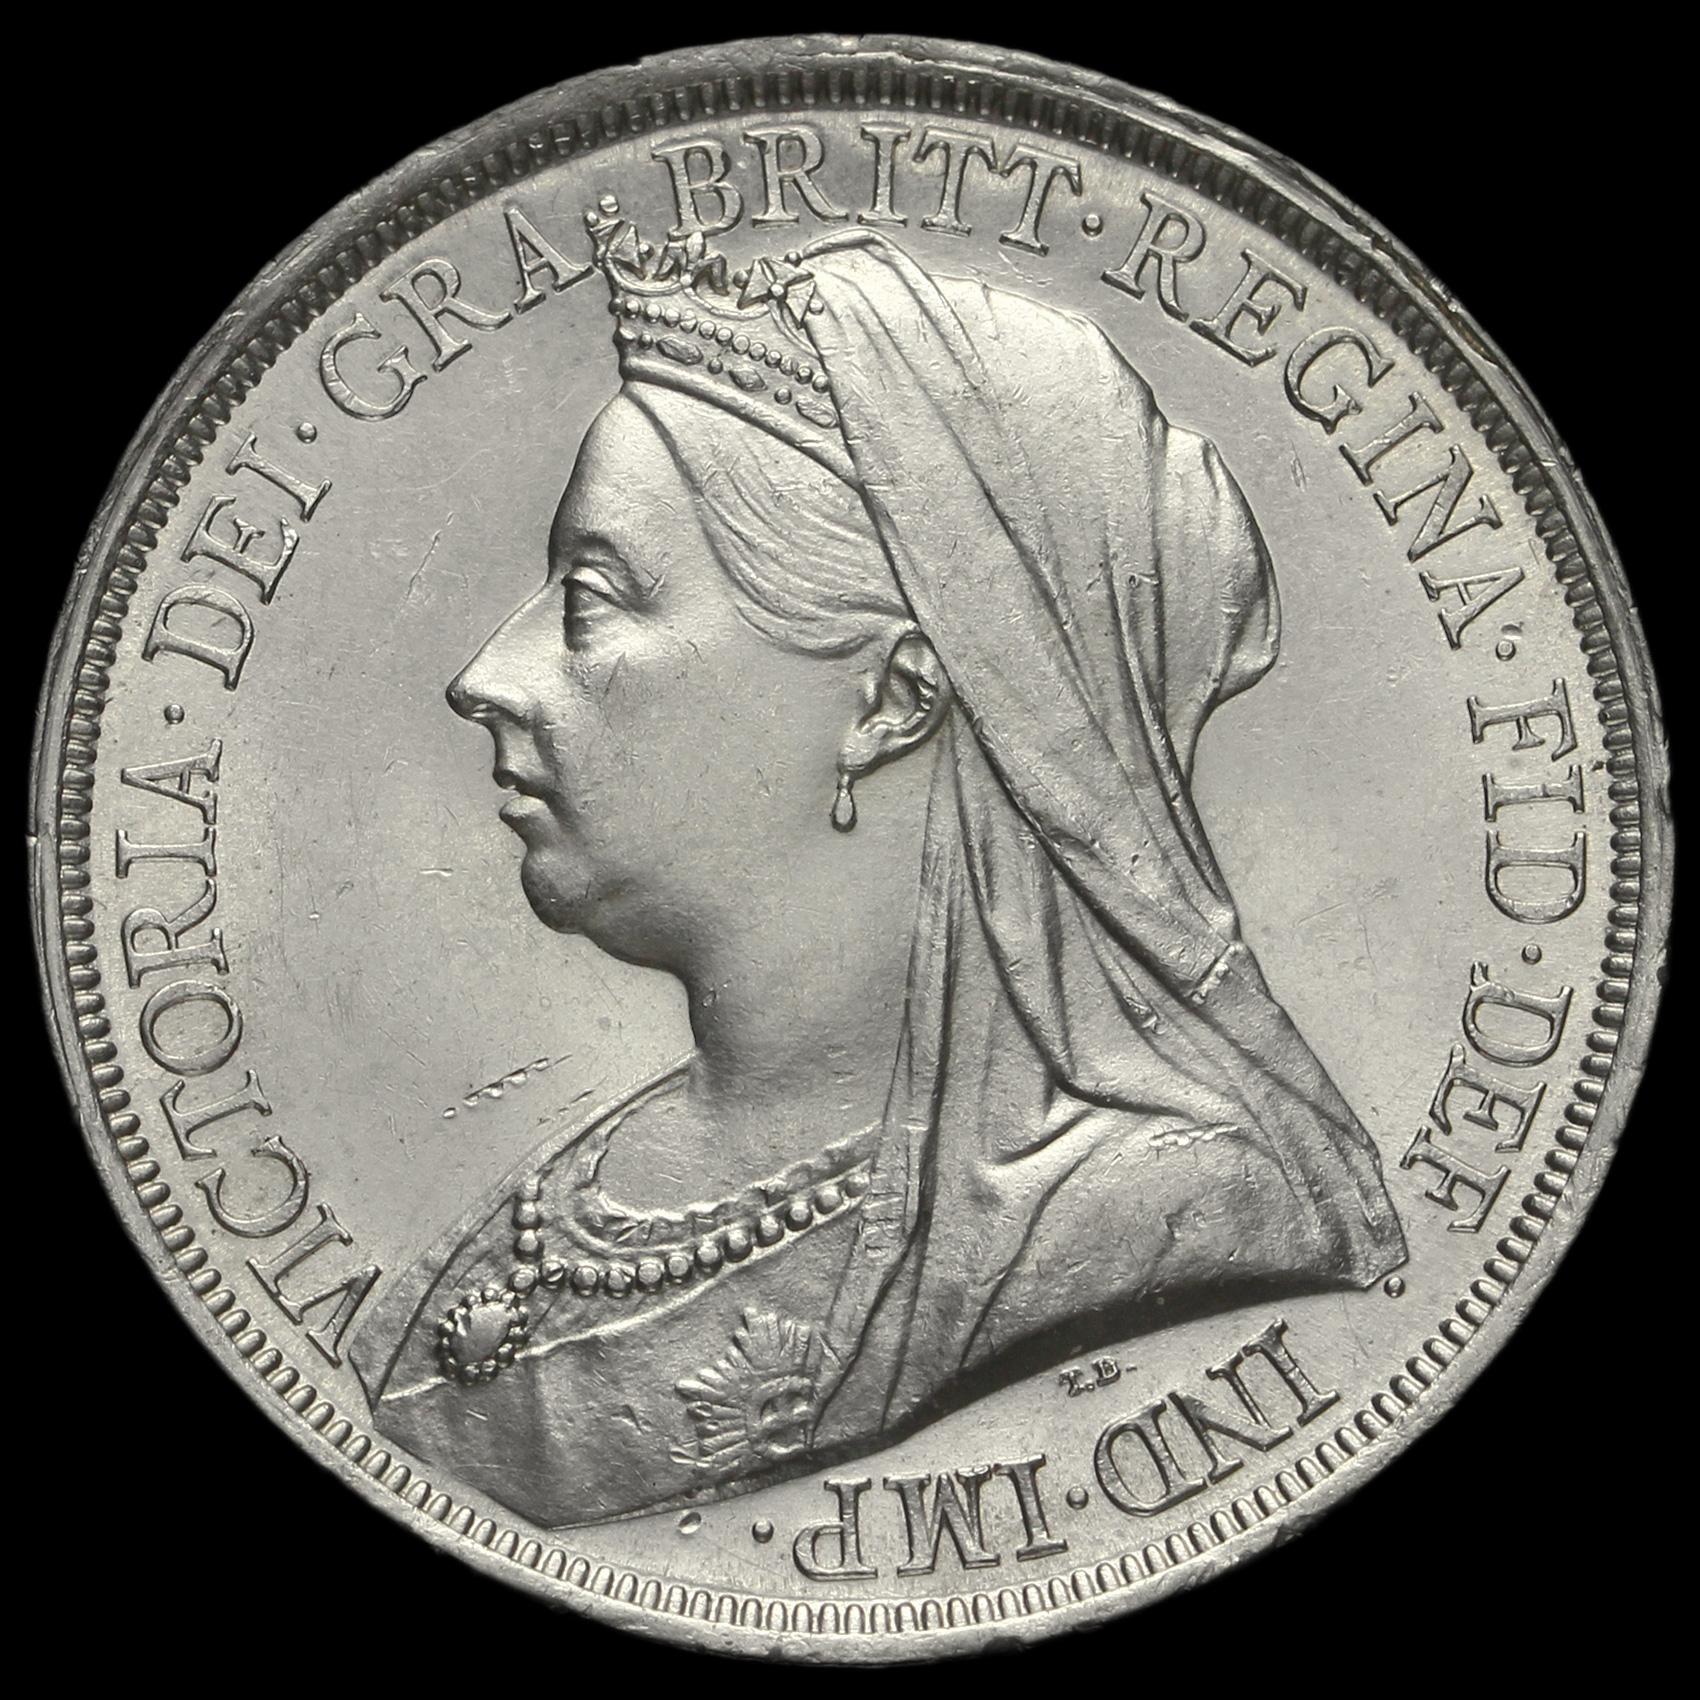 1893 Queen Victoria Veiled Head Silver Lvi Crown G Ef 2